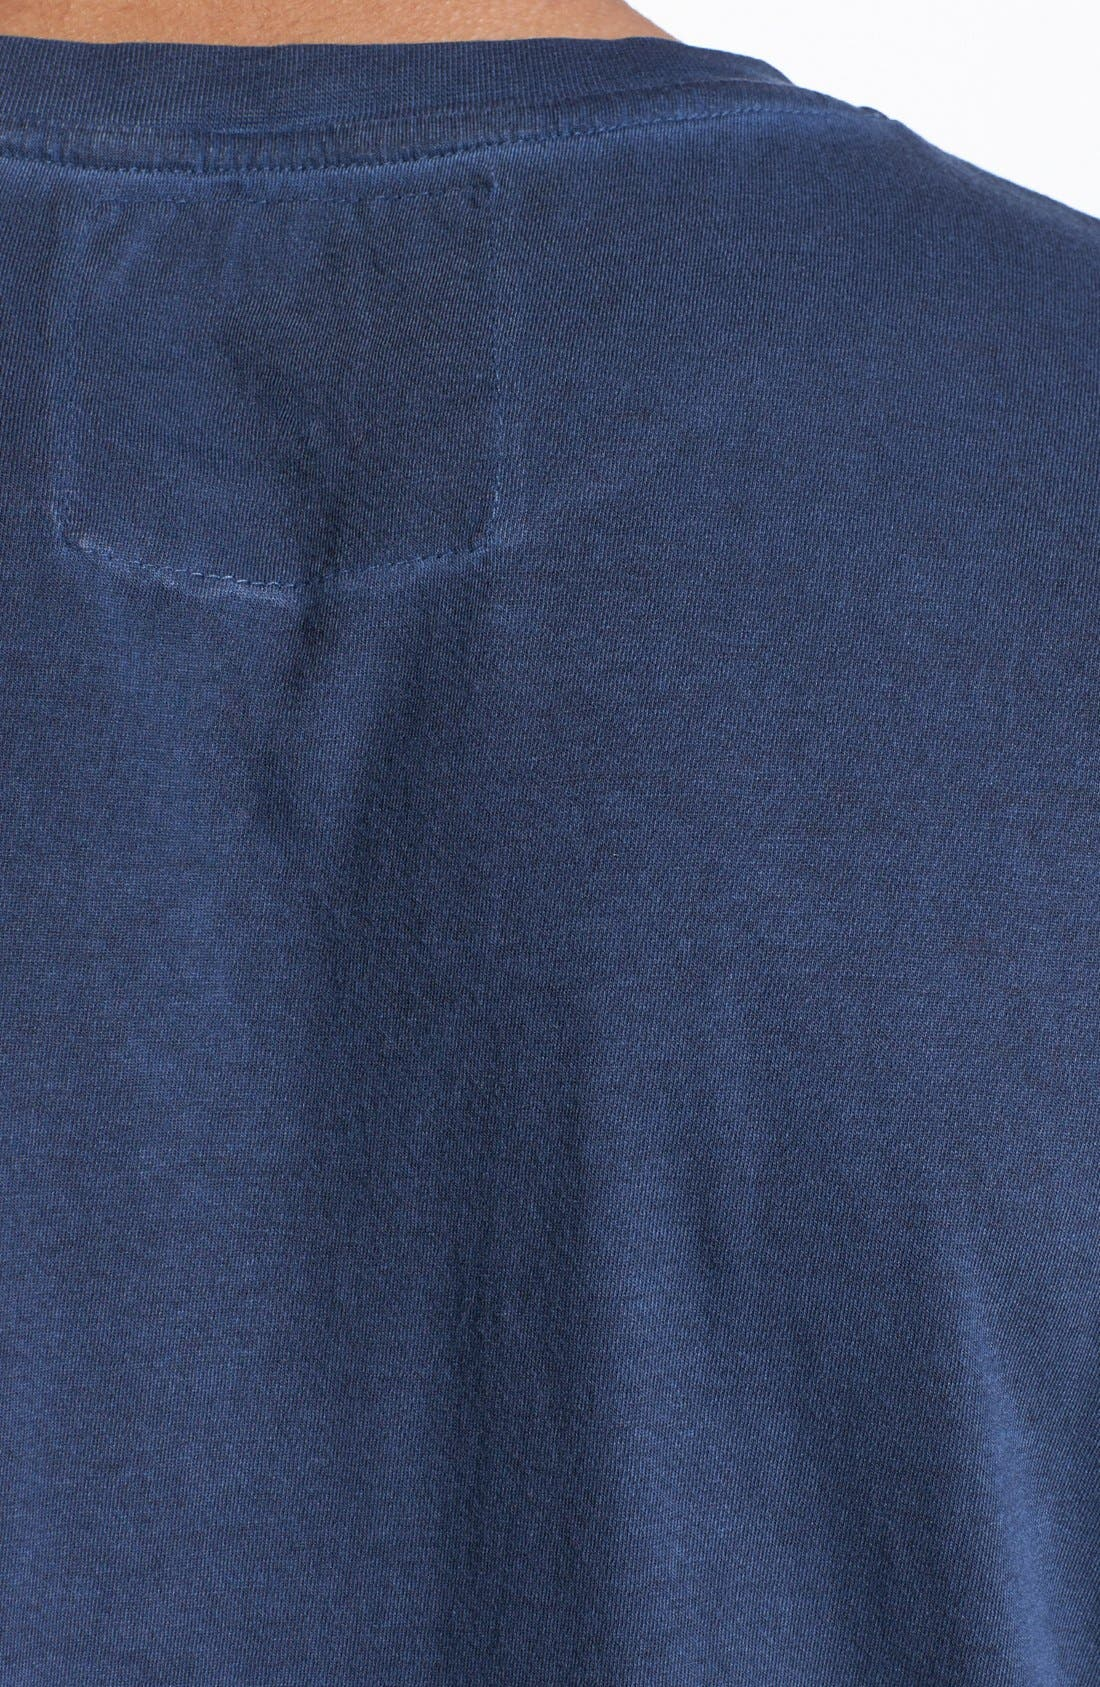 Alternate Image 3  - Red Jacket 'Red Sox - Merit' T-Shirt